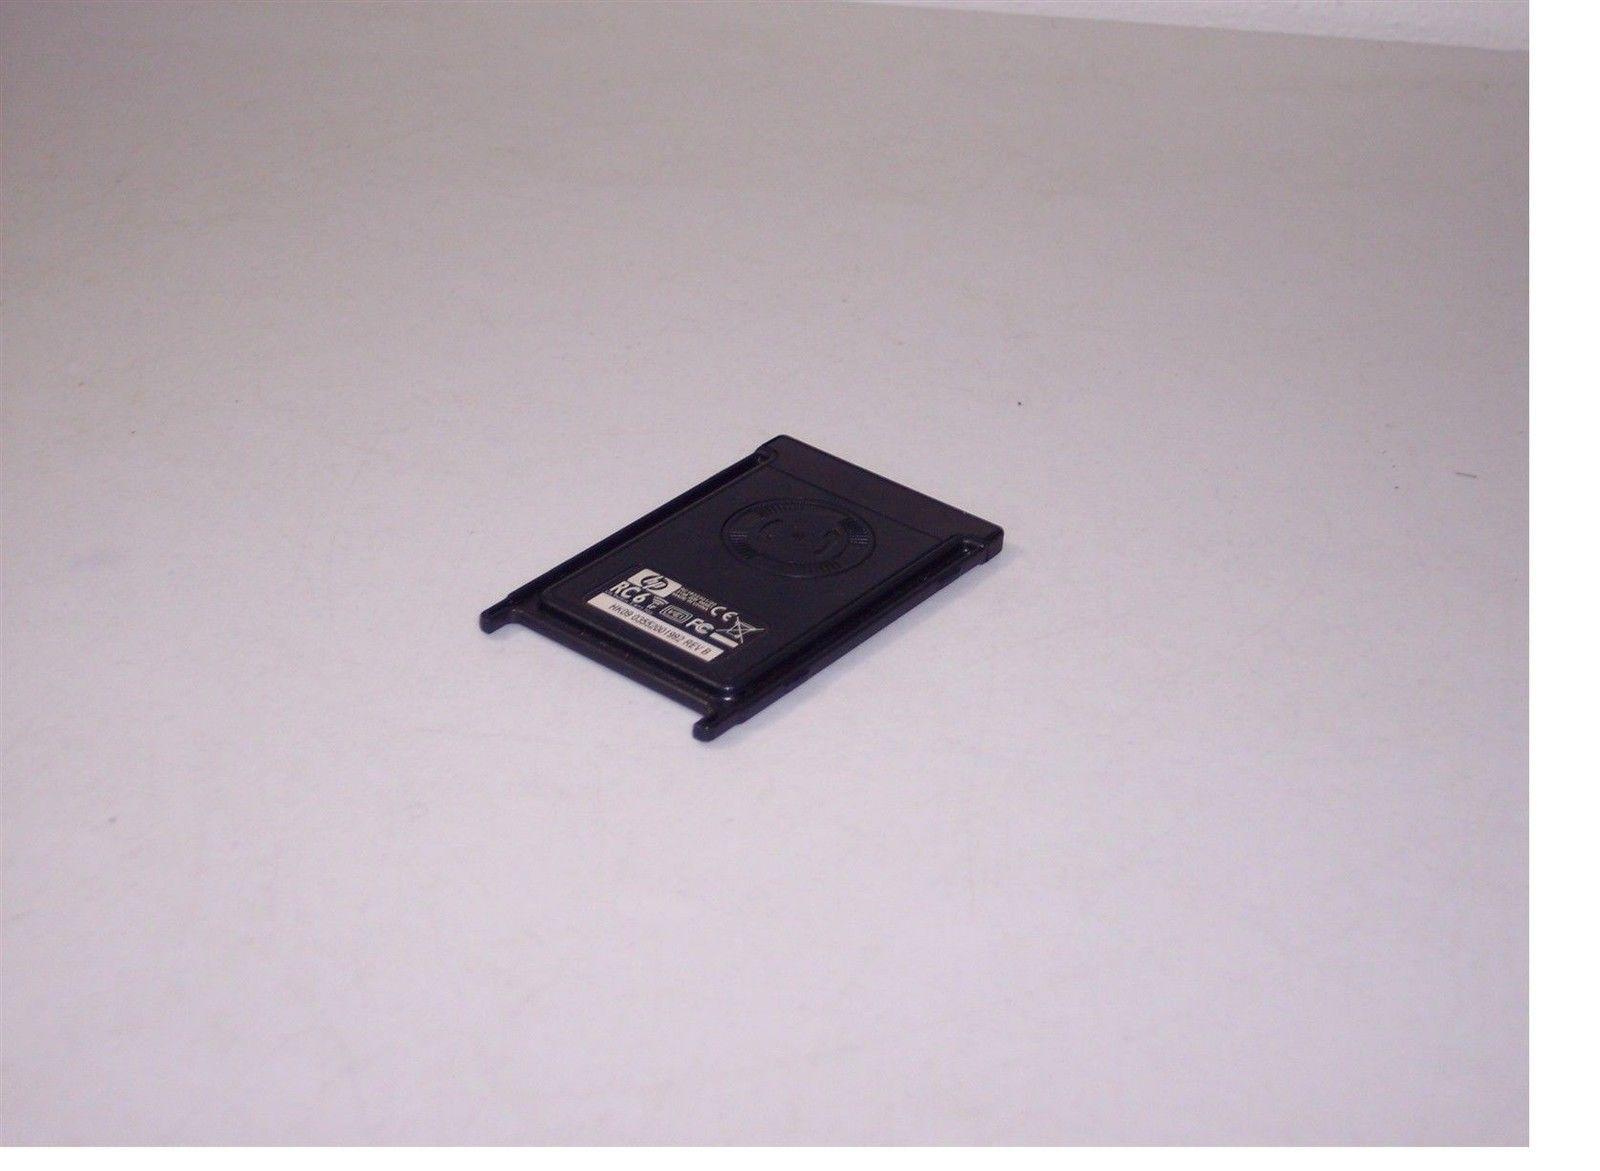 OEM HP Pavilion DV8000 Series Laptop Remote Control RC1622301/00 RC1622301 00